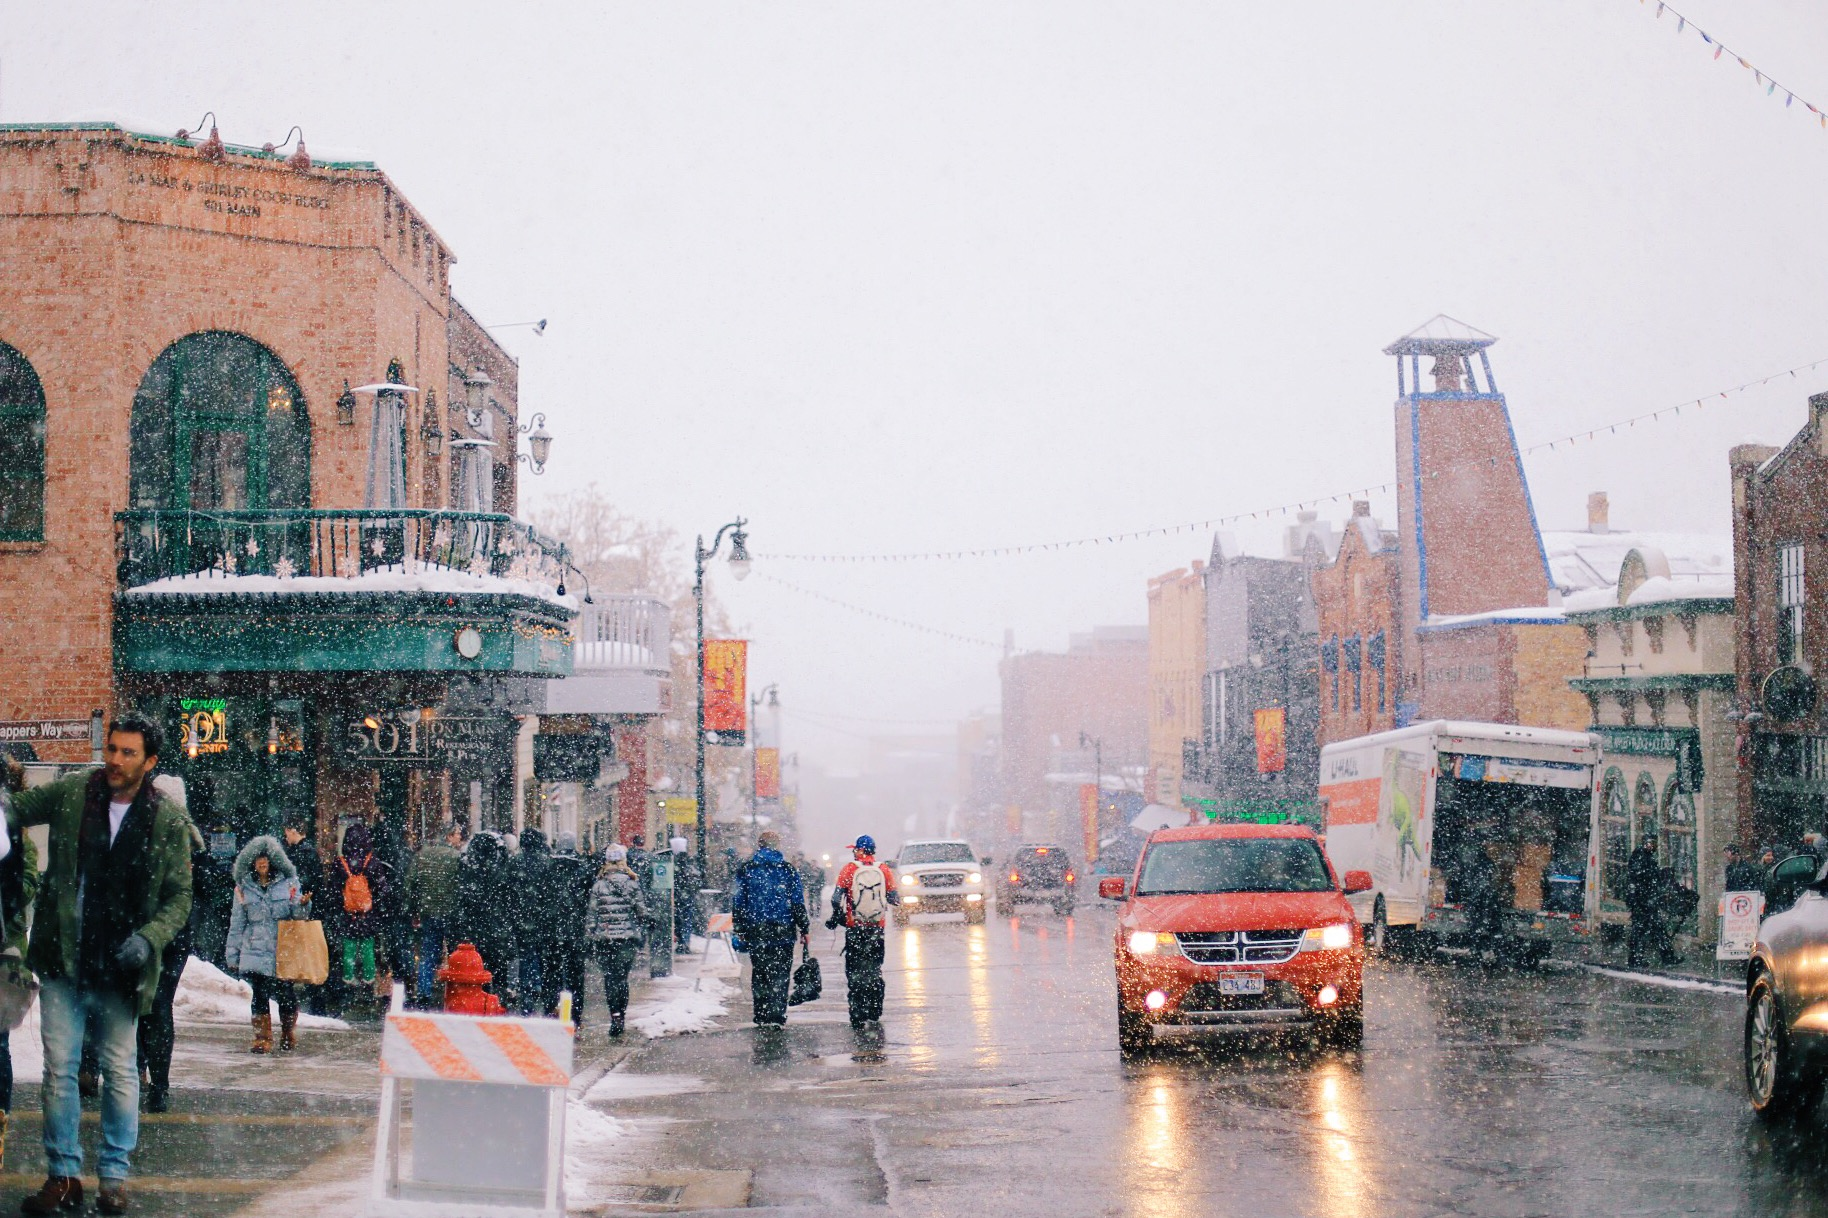 The beginning of a Sundance Film Festival blizzard!